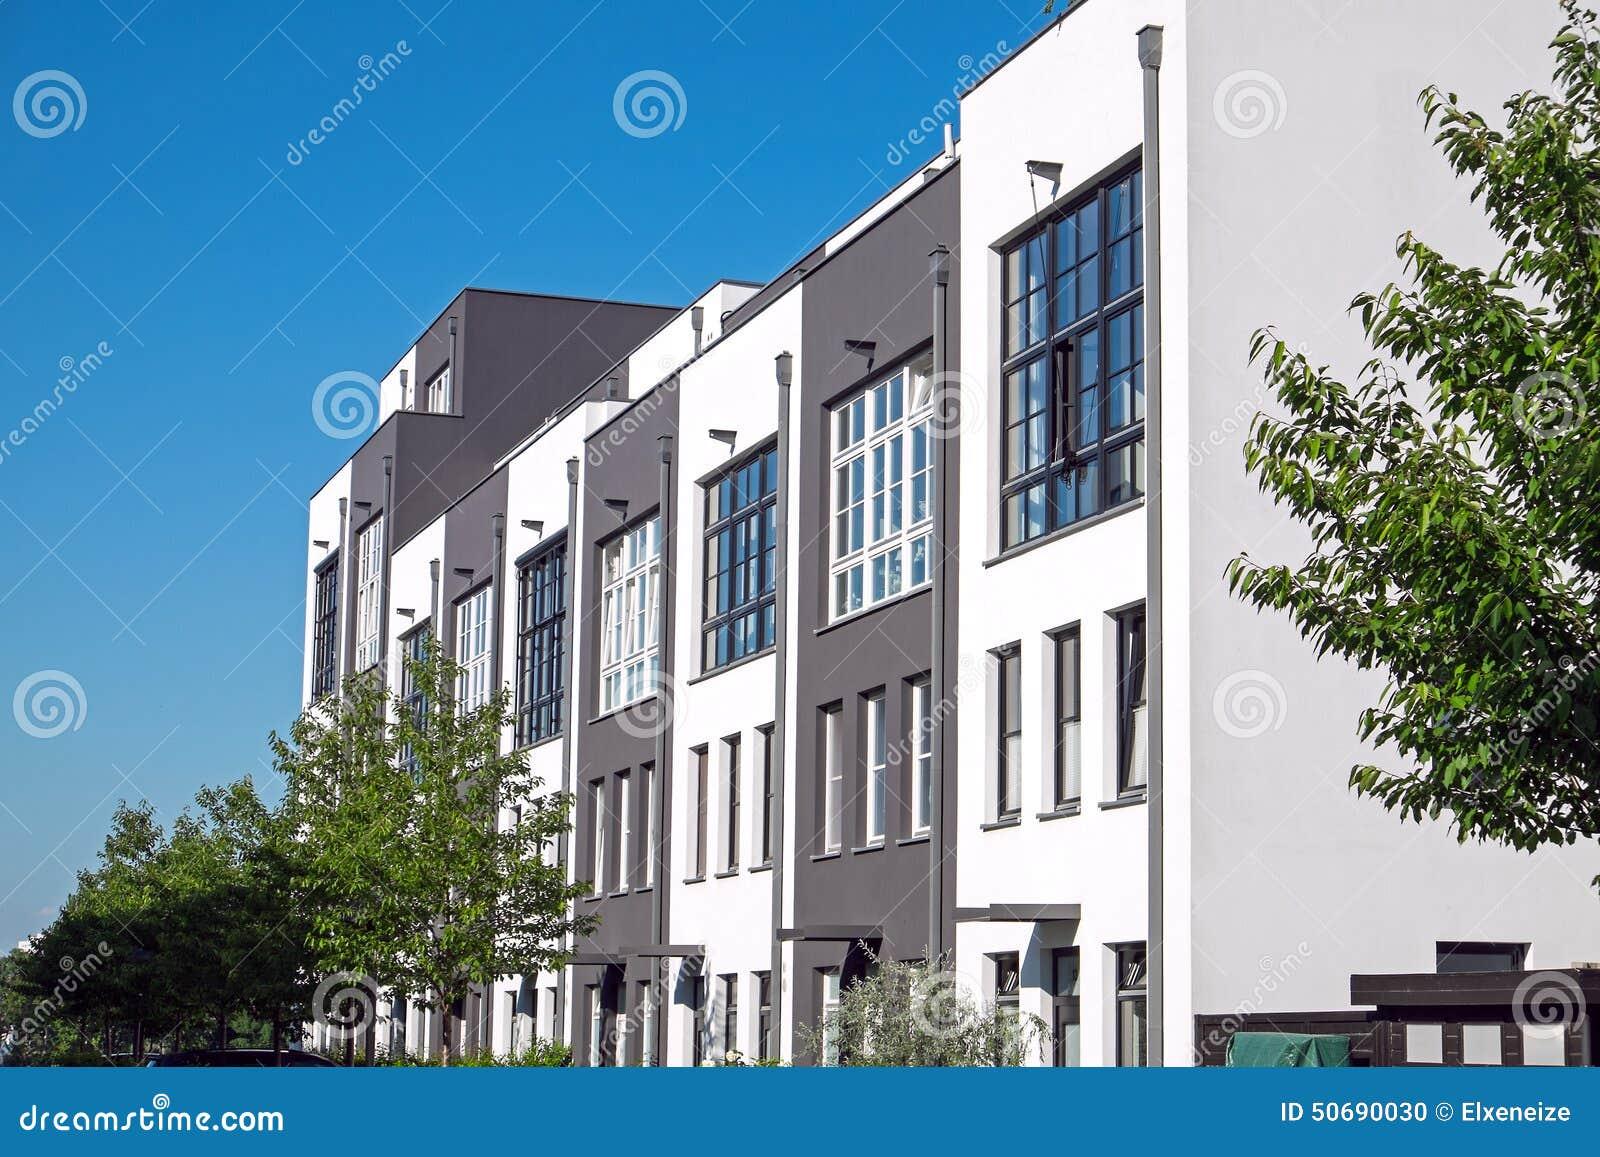 Download 现代连续住房在柏林 库存照片. 图片 包括有 庄园, 蓝色, 现代, 结构树, 工厂, 房子, 露台, 天空 - 50690030